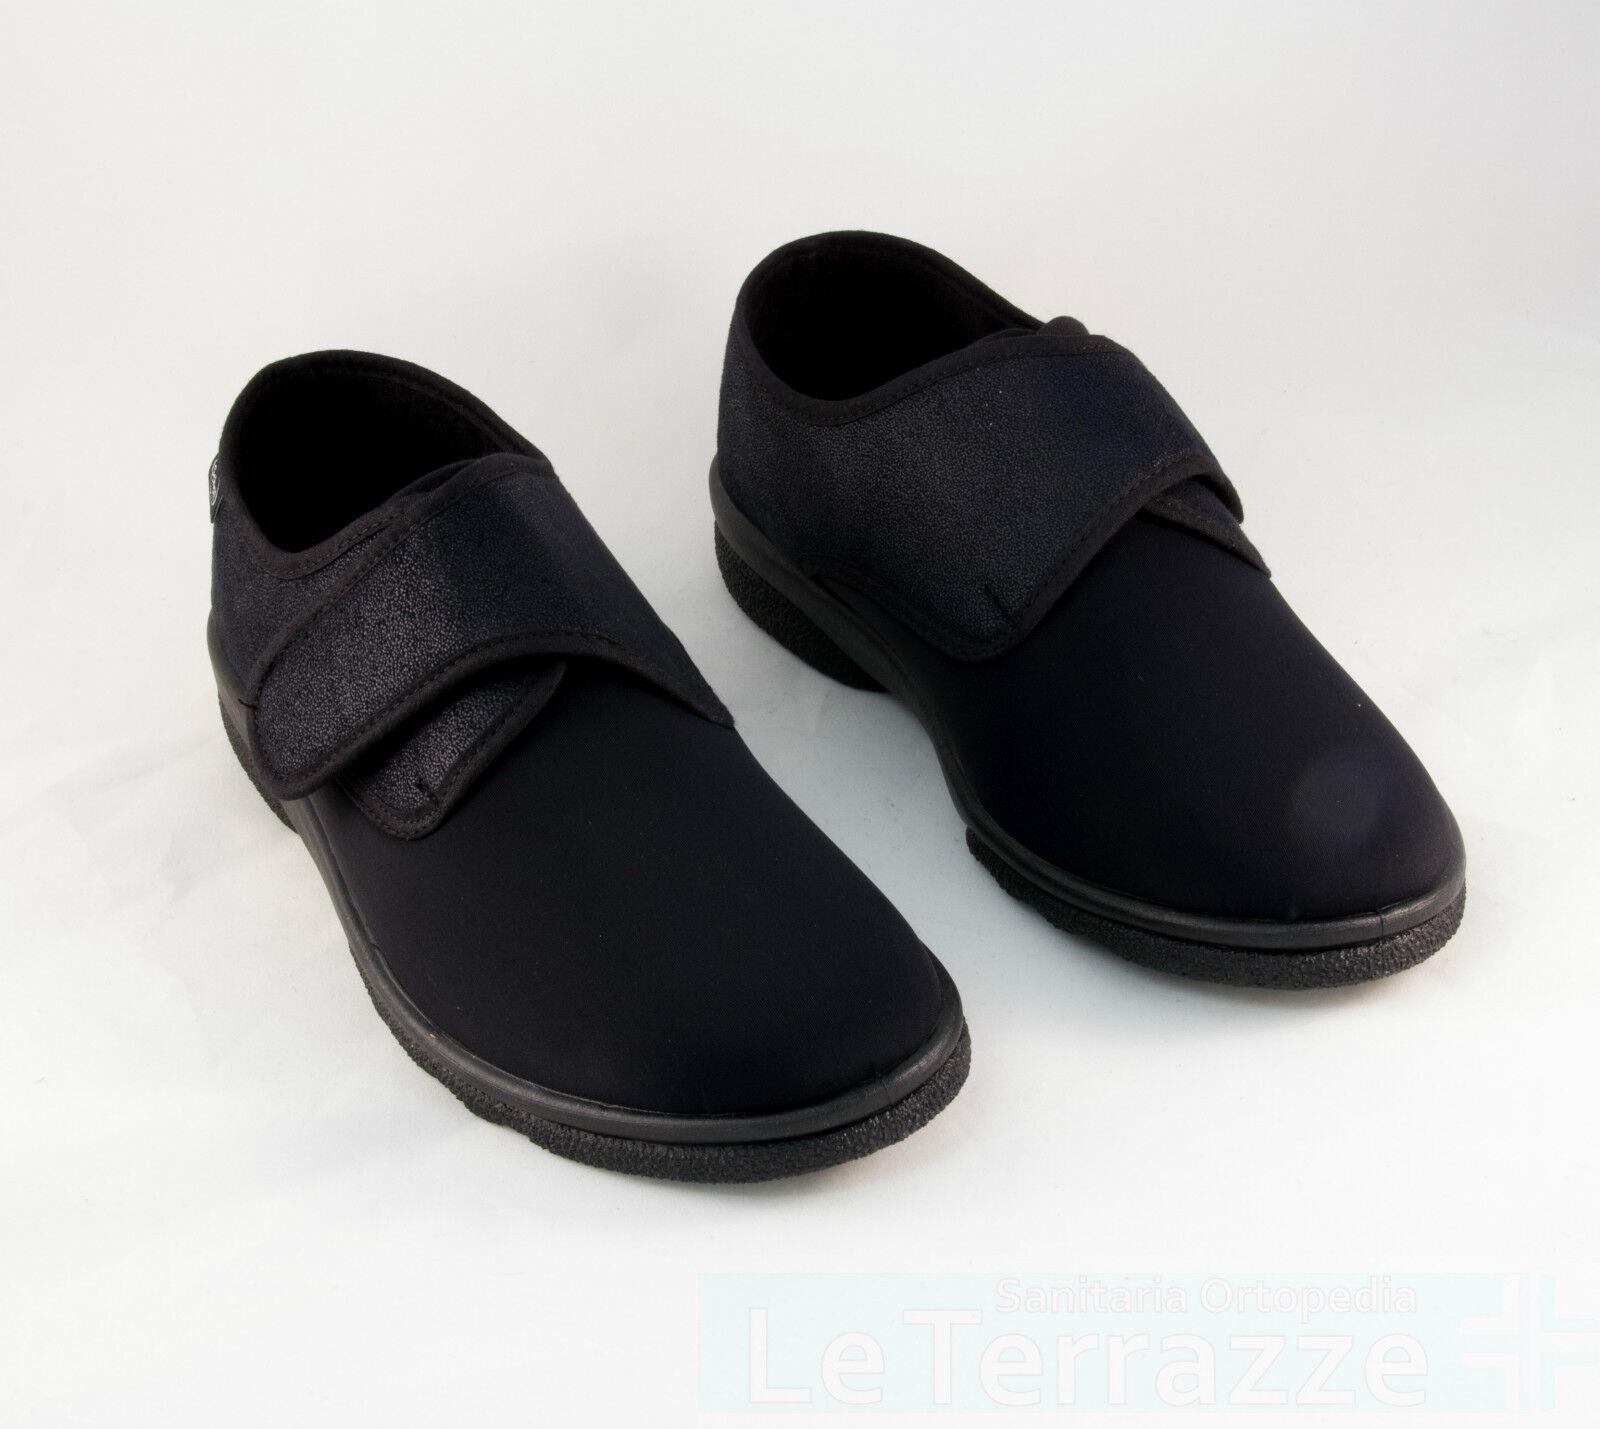 Dr Scholl Rhemes pantofole scarpe Memory Cushion riabilitazione scarpe